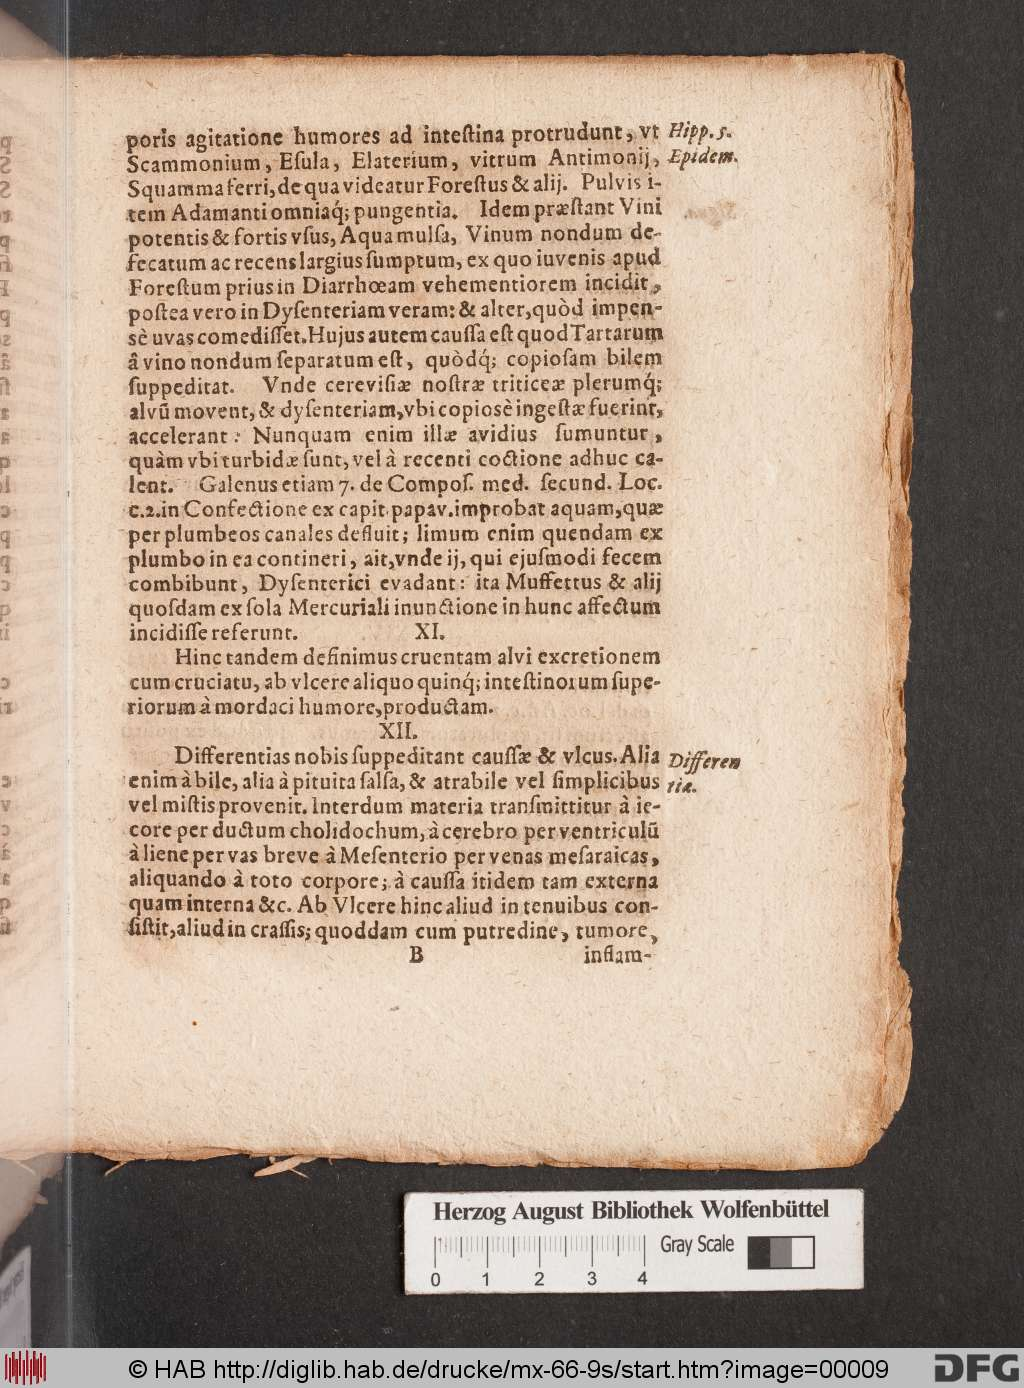 http://diglib.hab.de/drucke/mx-66-9s/00009.jpg